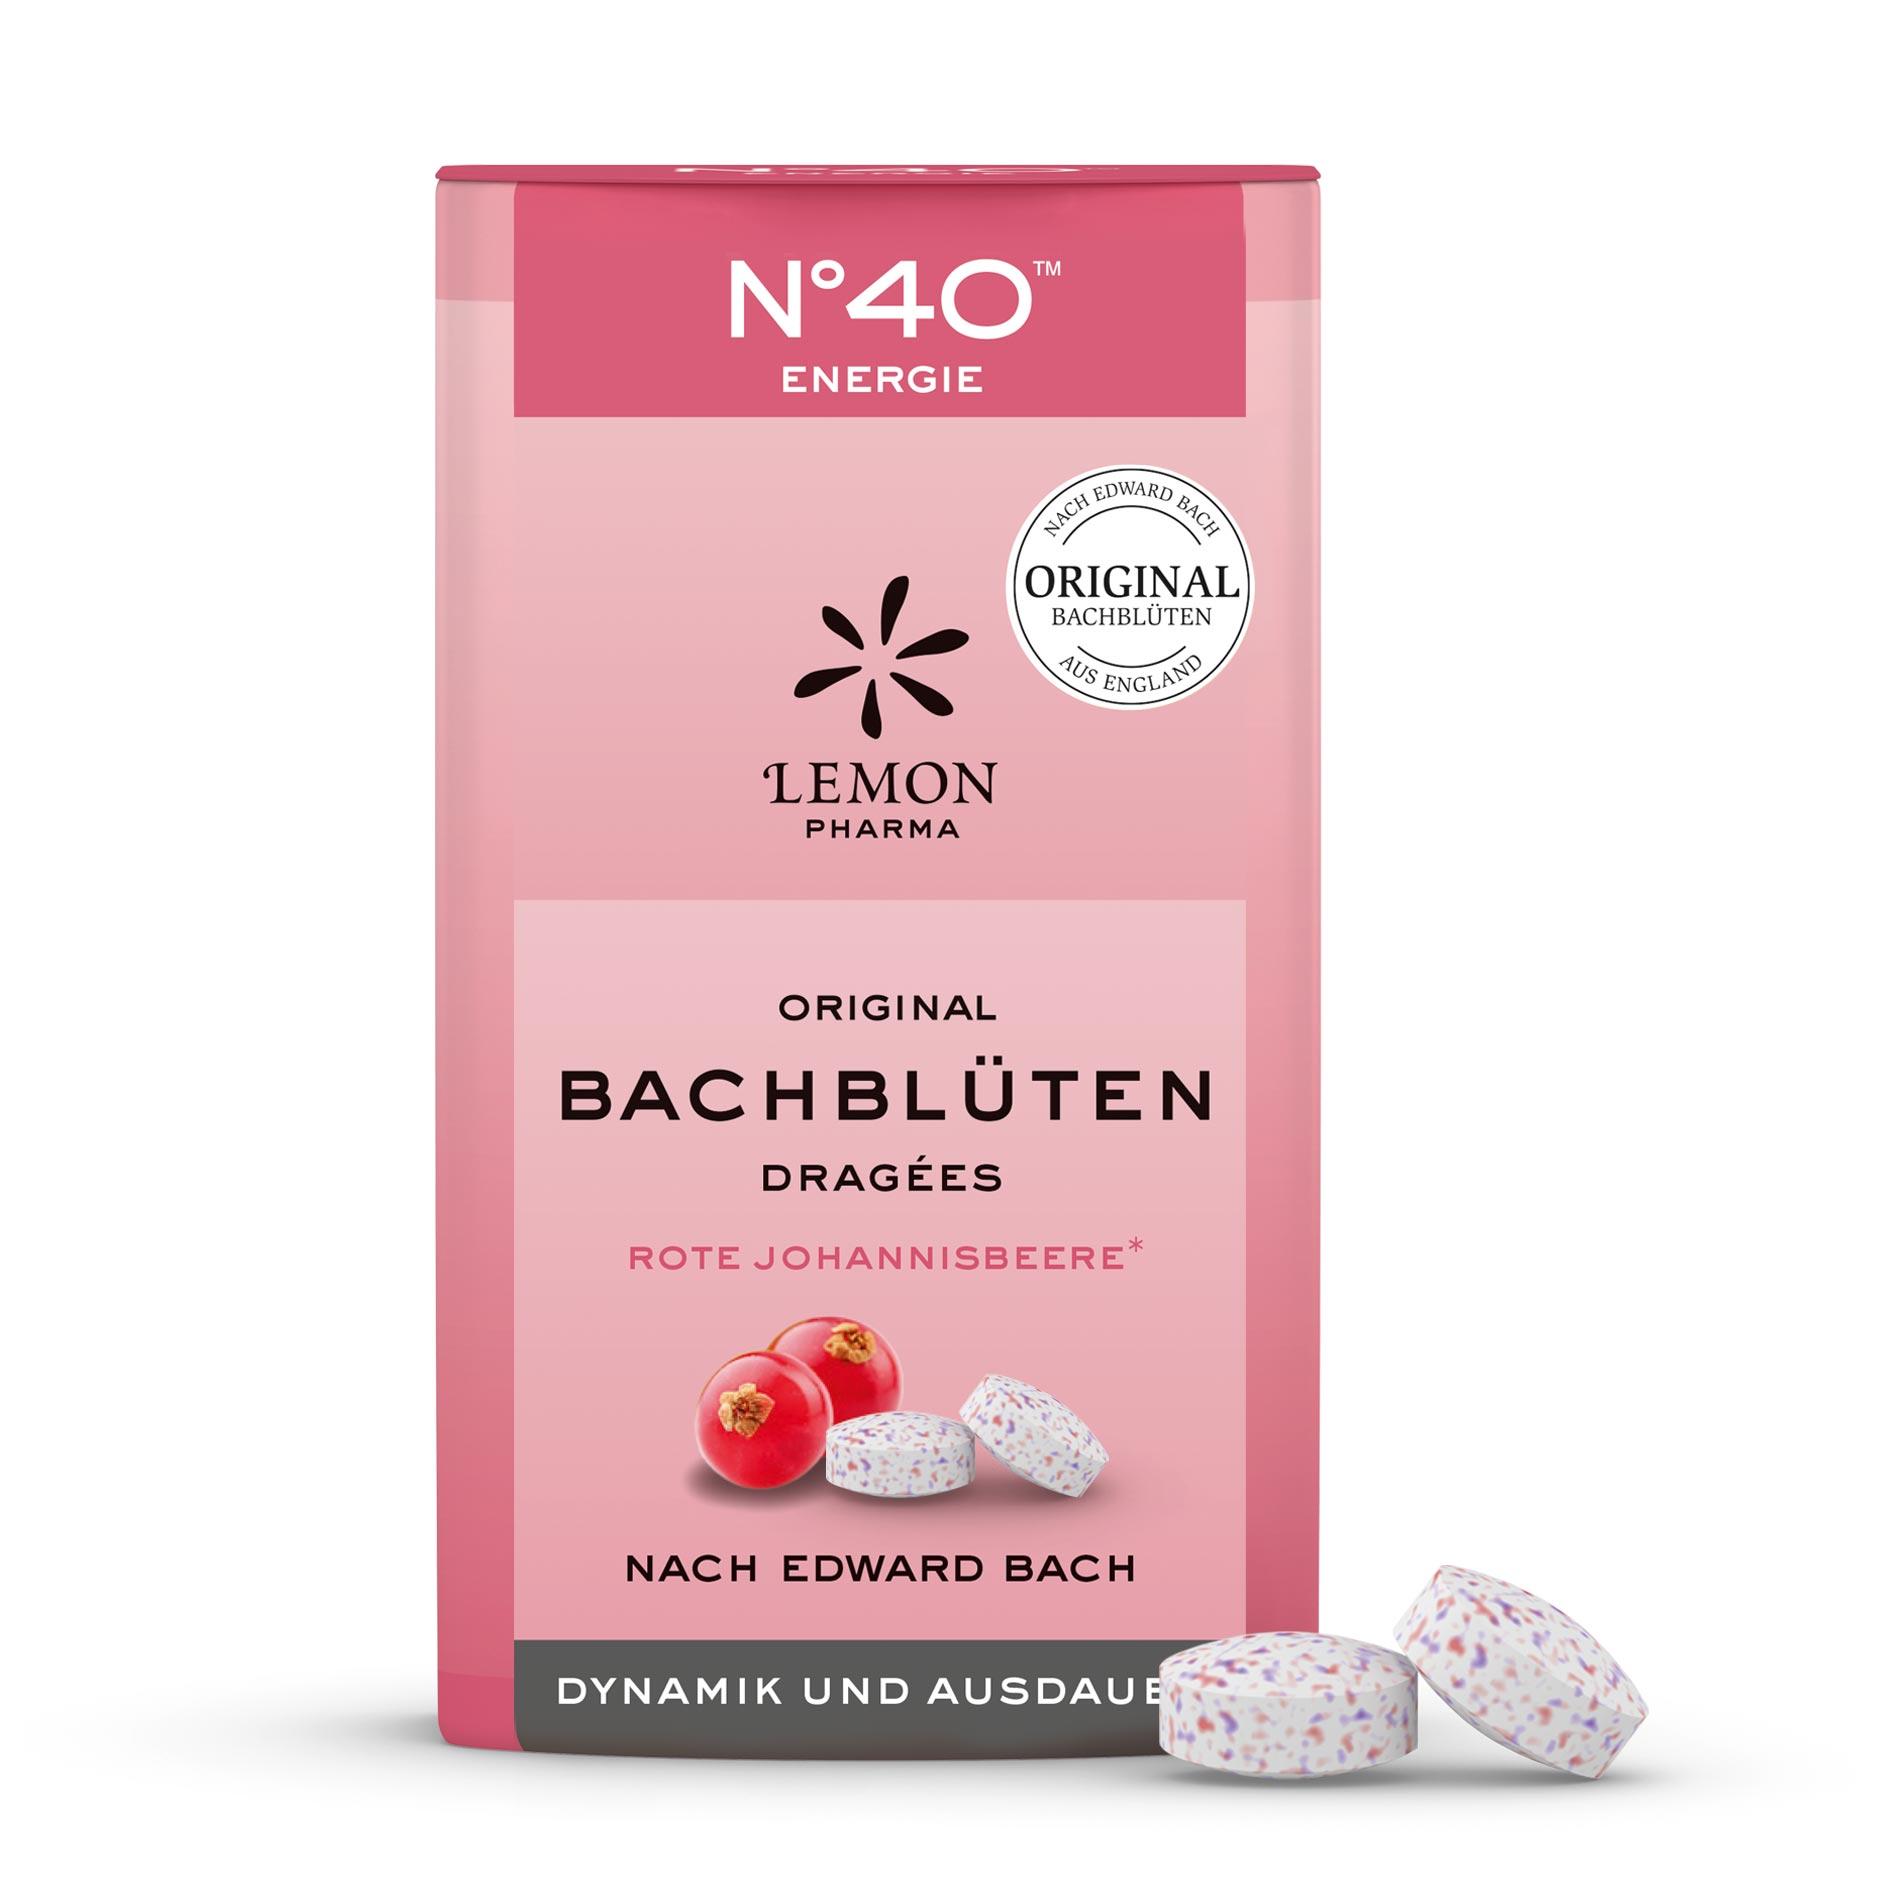 Fiori di Bach originali Lemon Pharma Nr 40  Energia Confetti Dinamismo e resistenza hornbeam